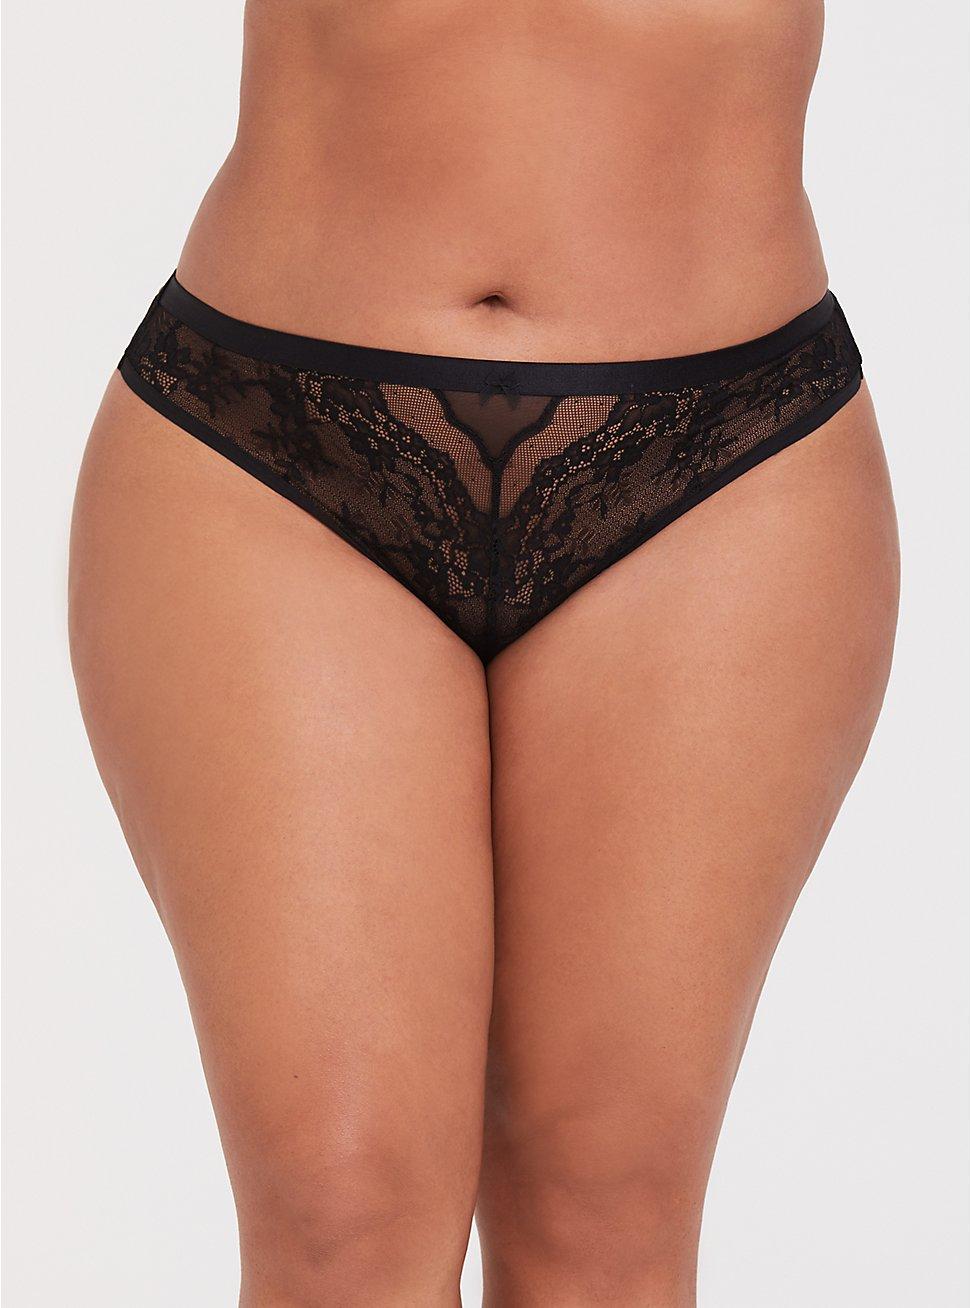 Black Mesh & Lace Thong Panty, , hi-res